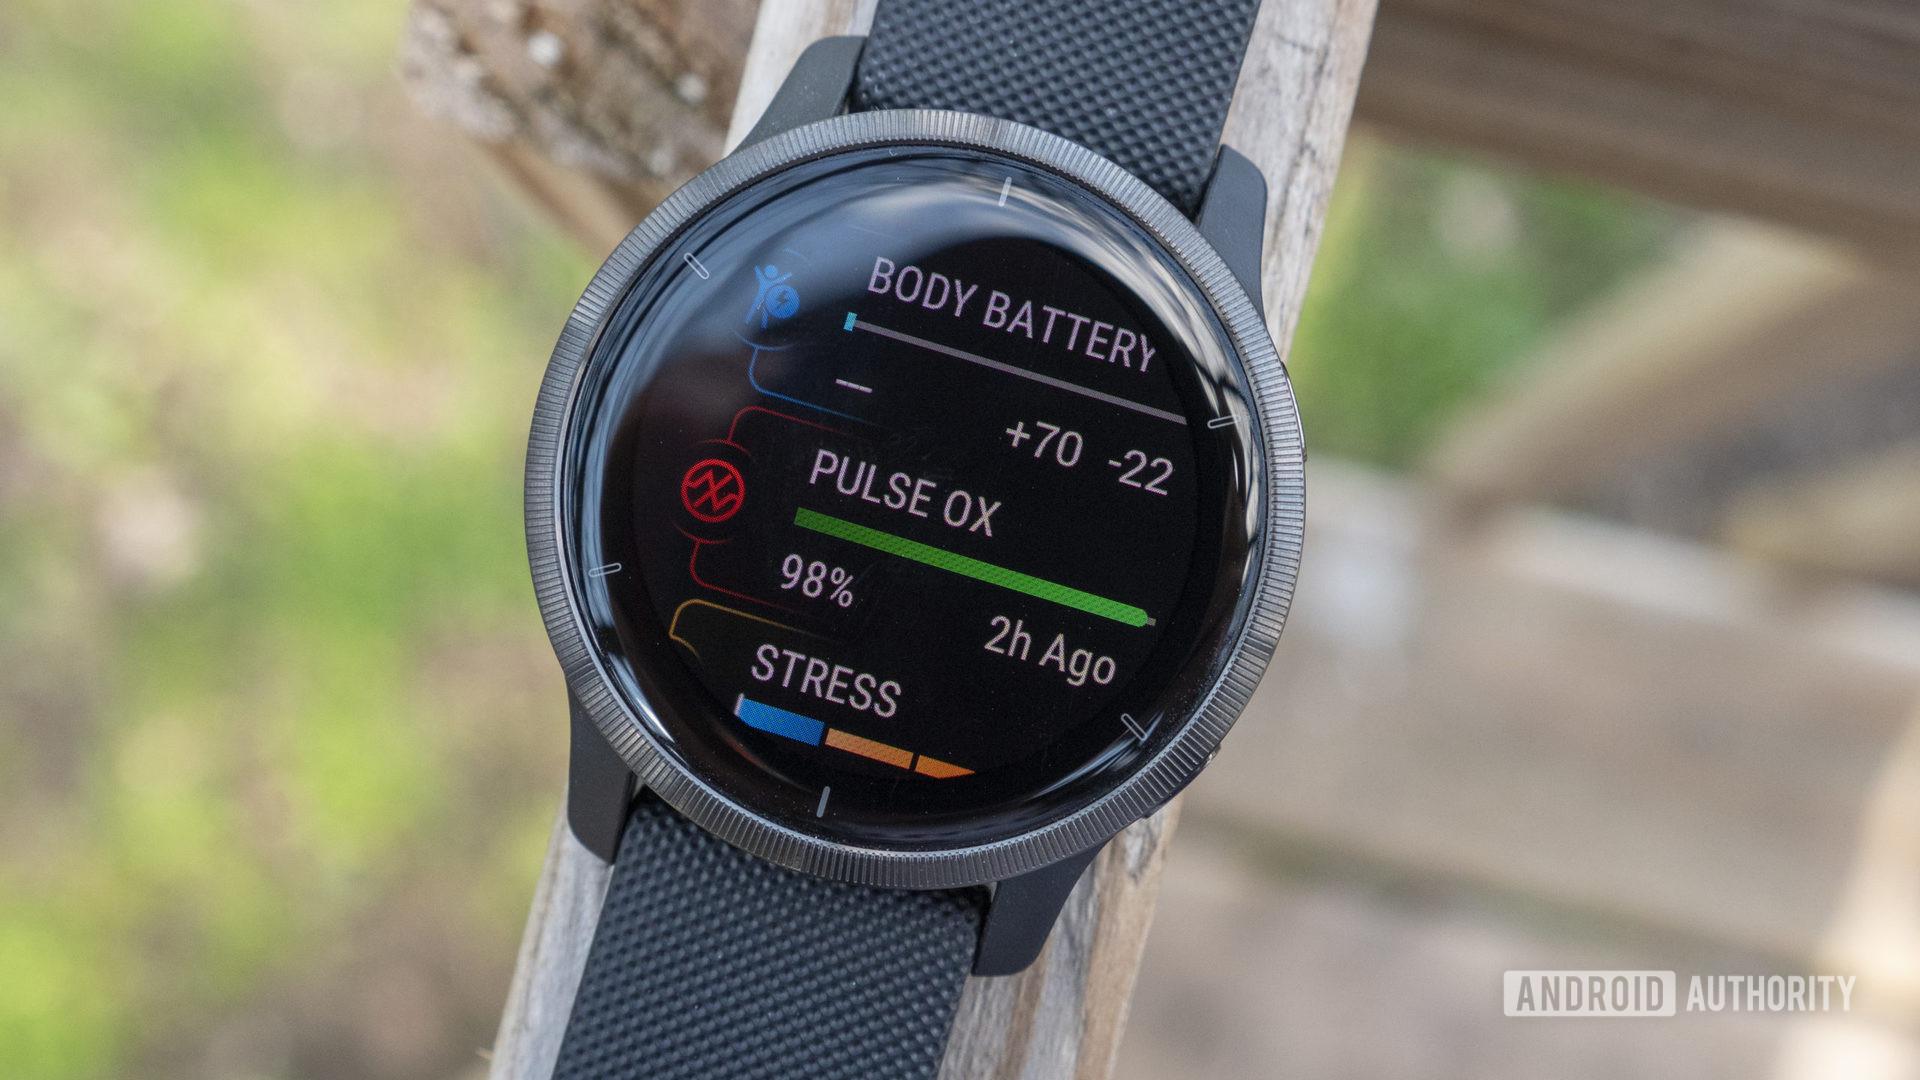 garmin venu 2 review glances body battery pulse ox stress